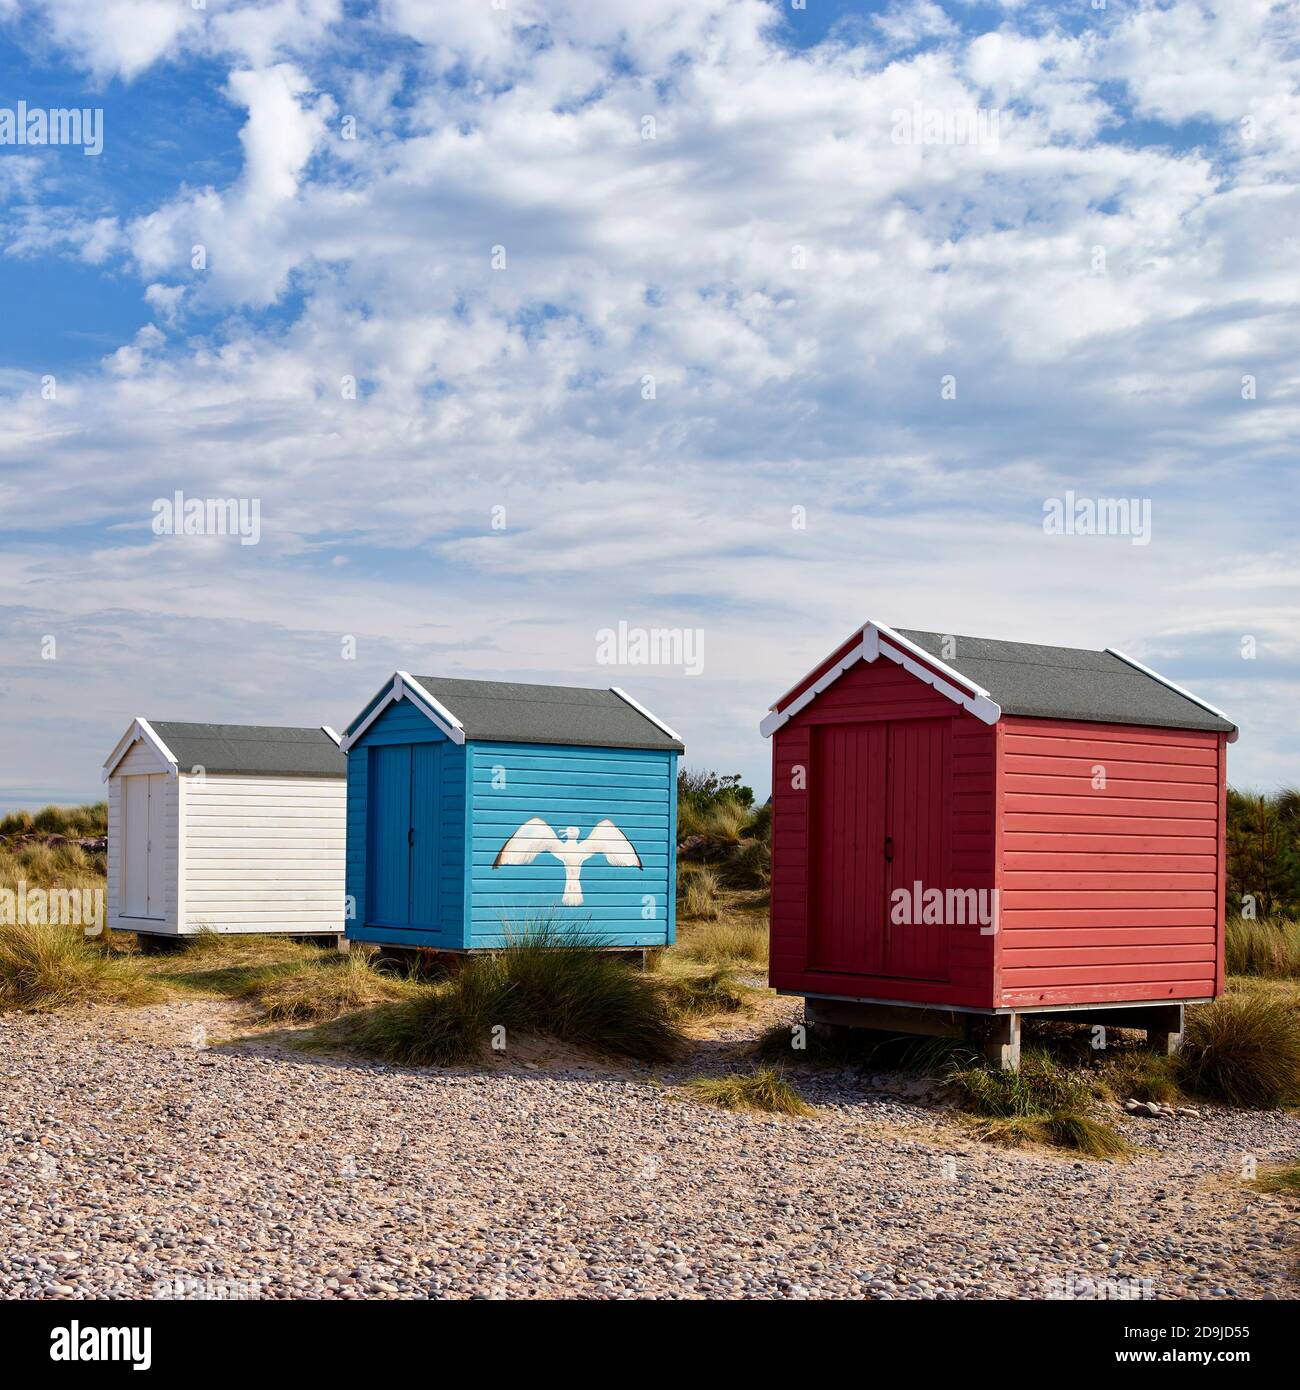 Colouful beach huts at Findhorn beach, Moray, Scotland. Stock Photo